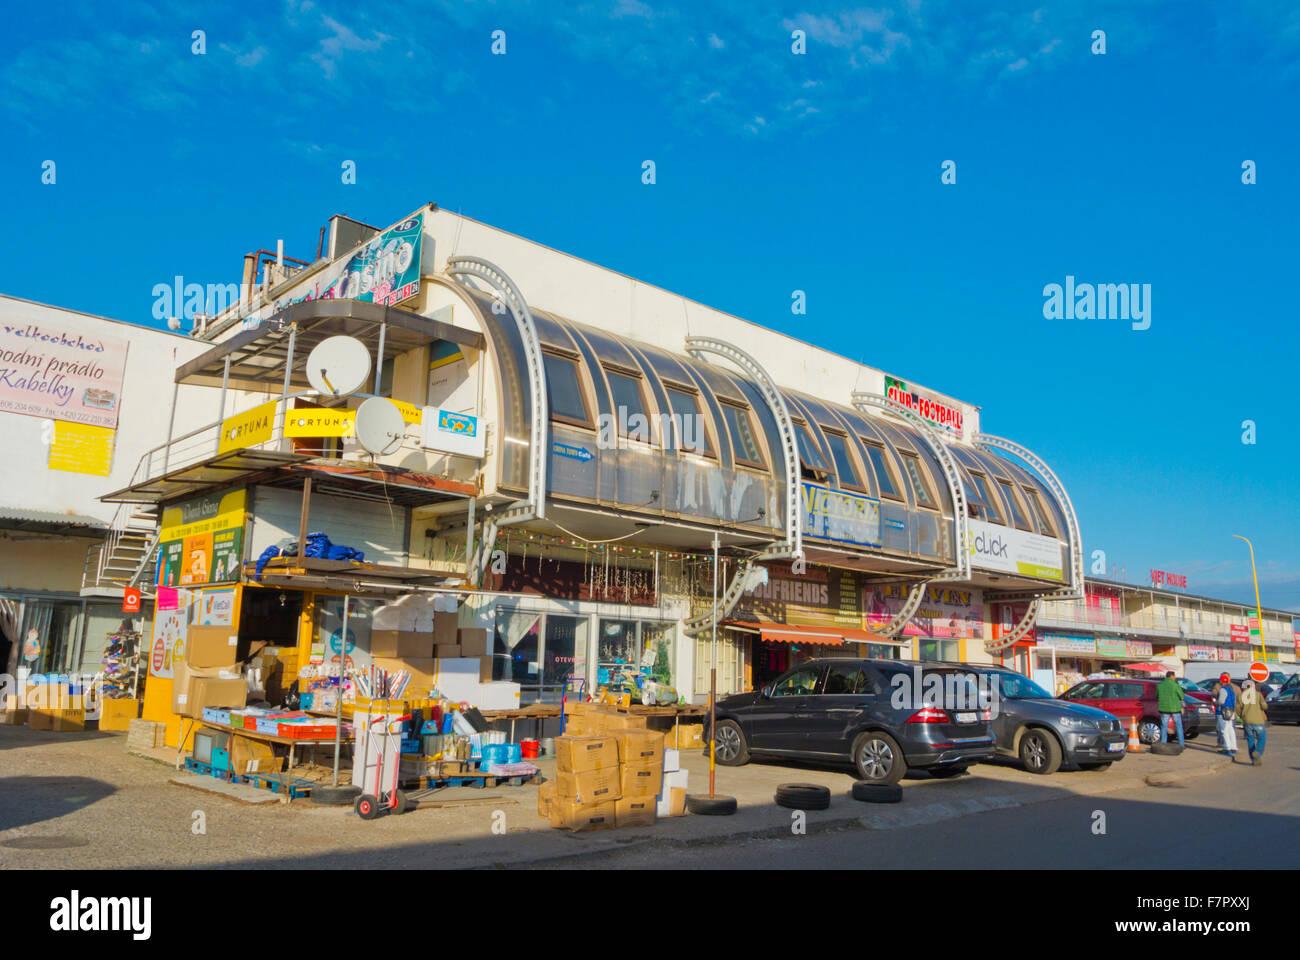 SAPA, the Vietnamese market, Libus, Prague, Czech Republic Stock Photo